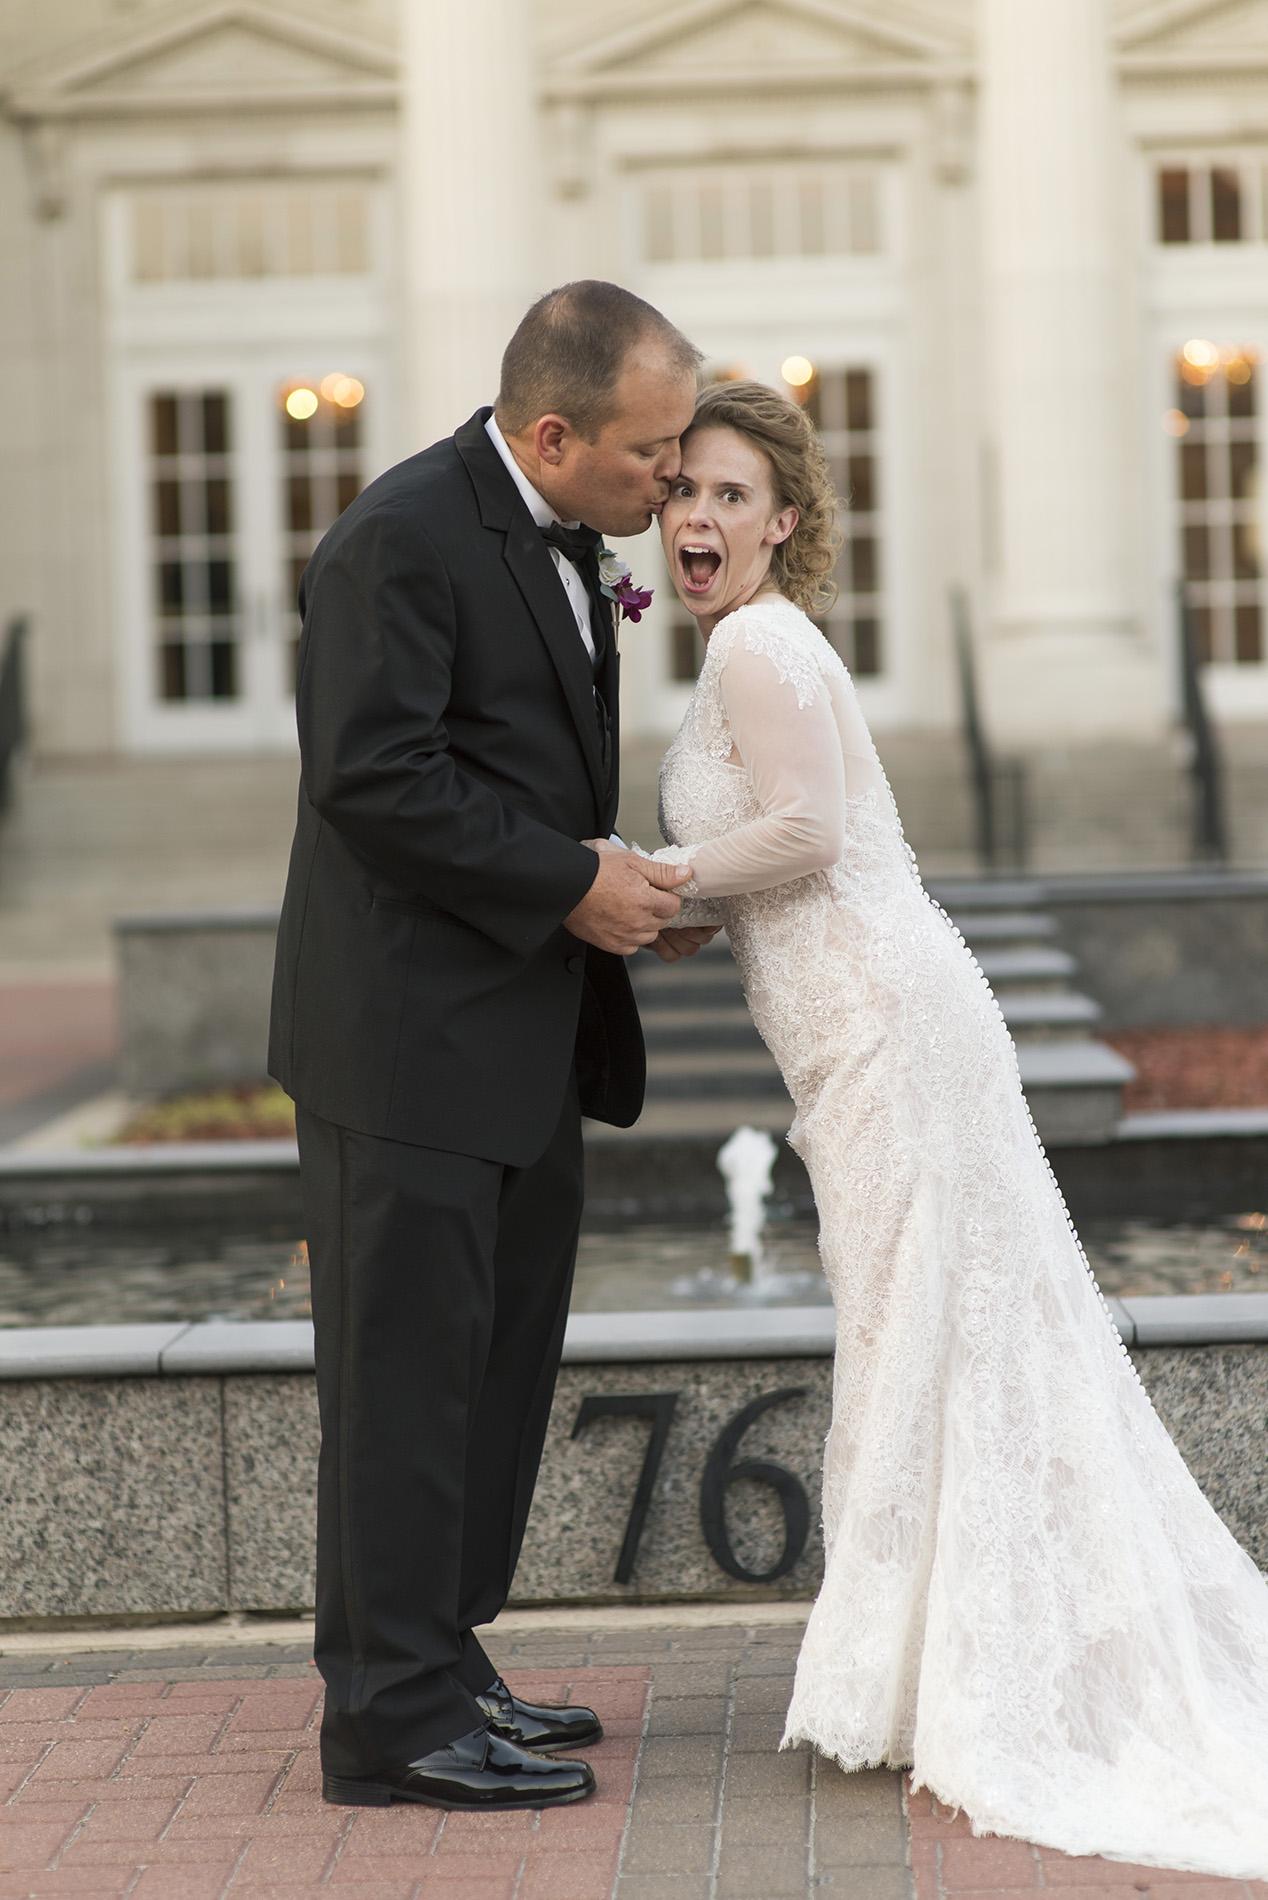 houston-artistic-lifestyle-wedding-photography-Laura_Tyson_Wedd_490.jpg